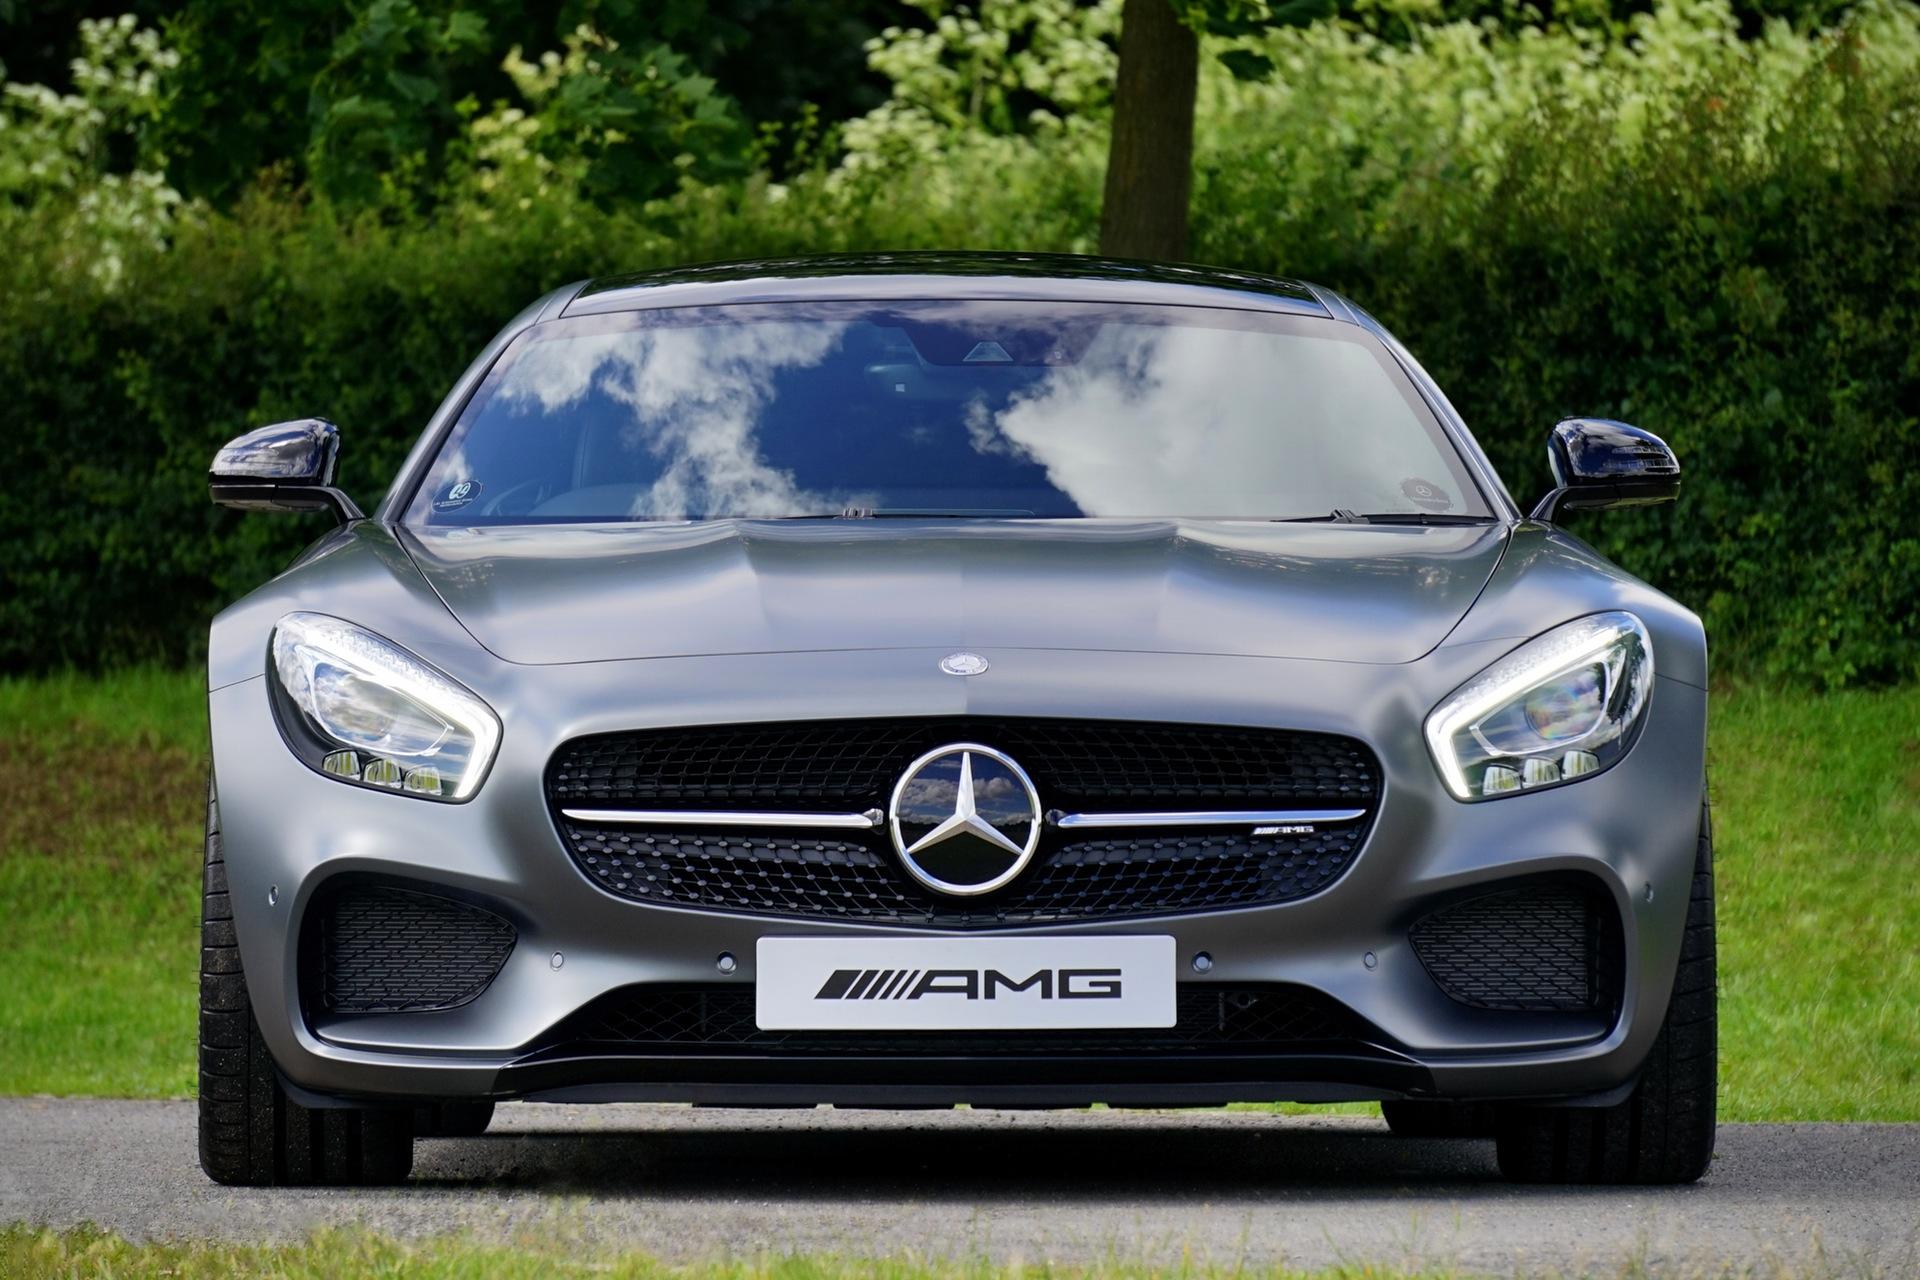 auto, lusso, Sport, Mercedes, Elite, Benz - Sfondi HD - Professor-falken.com